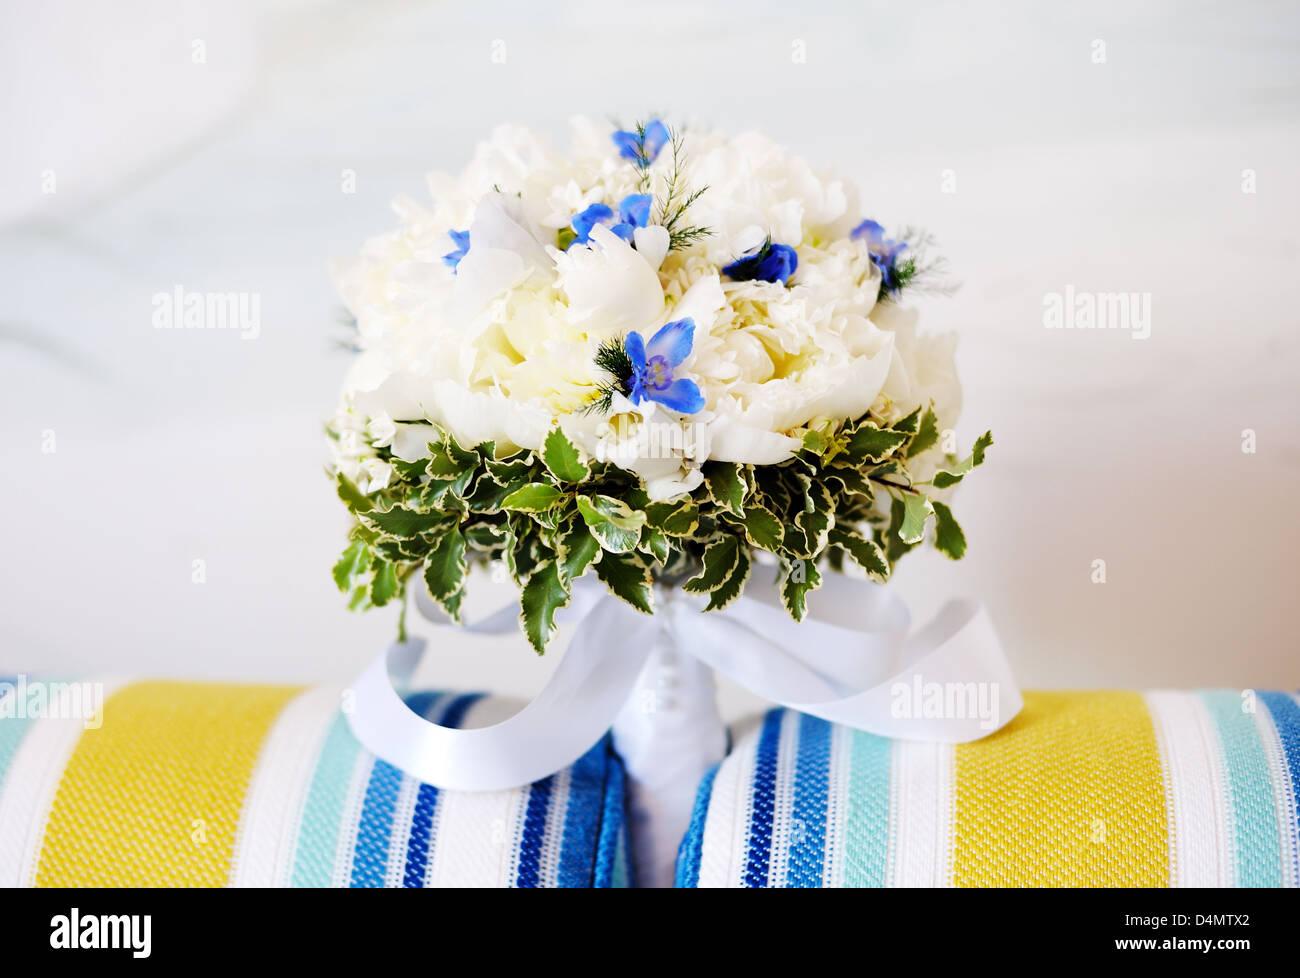 Wedding Weddings Reception Party Stock Photos & Wedding Weddings ...